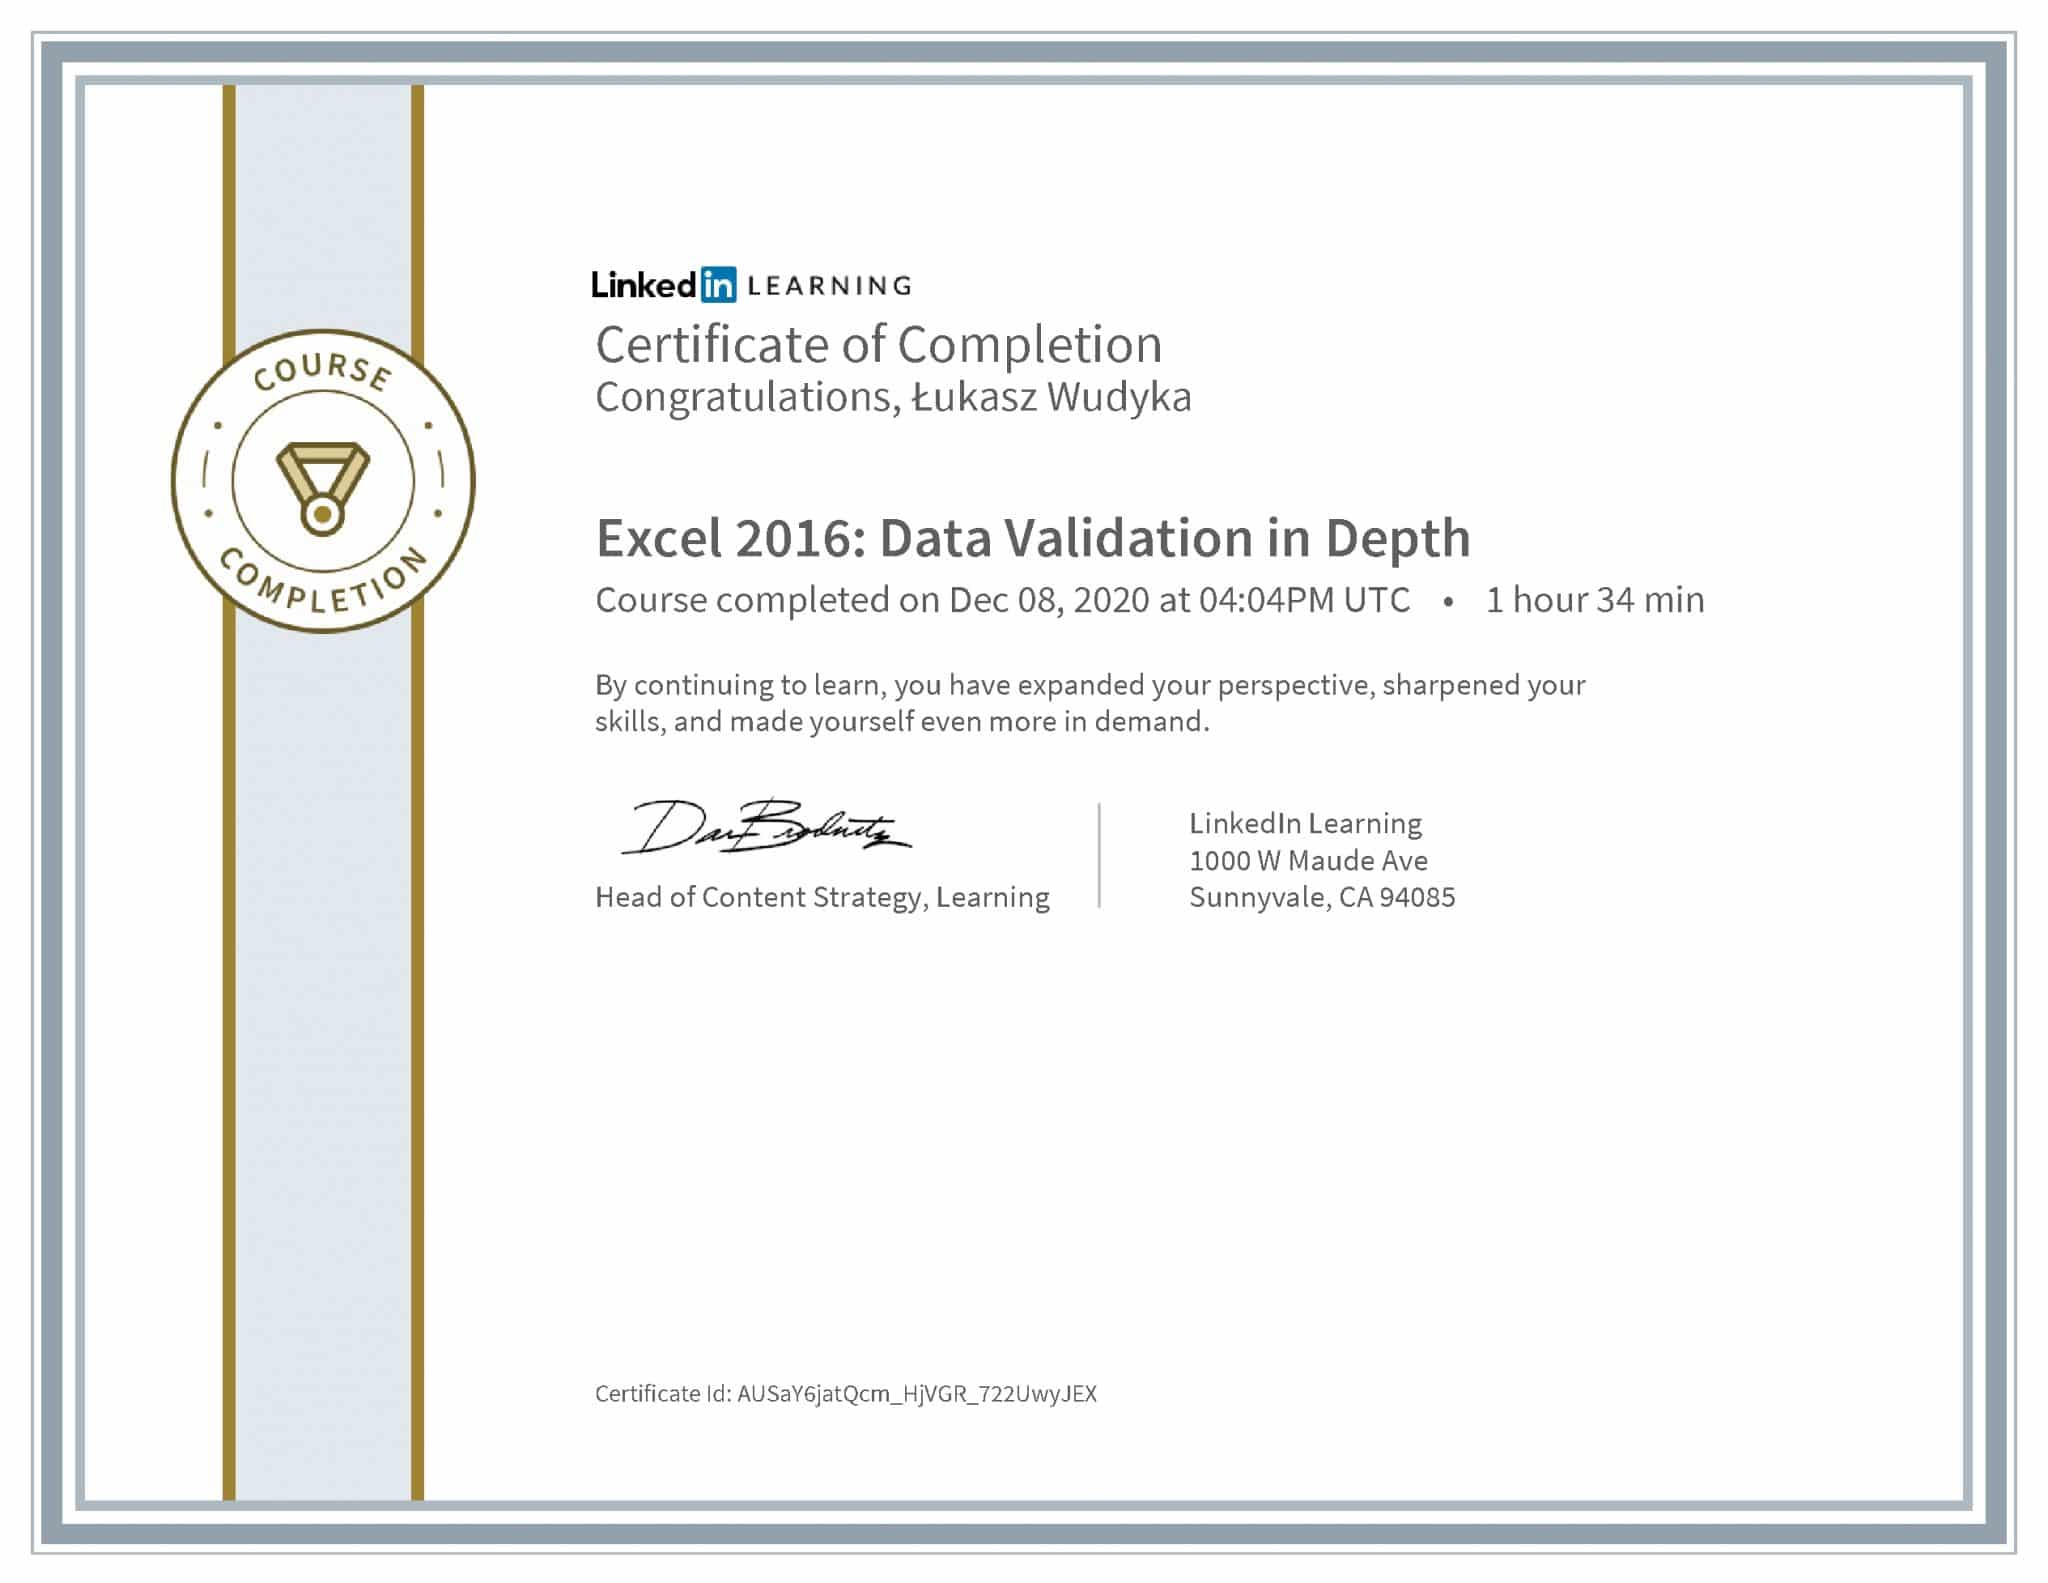 Łukasz Wudyka certyfikat LinkedIn Excel 2016: Data Validation in Depth